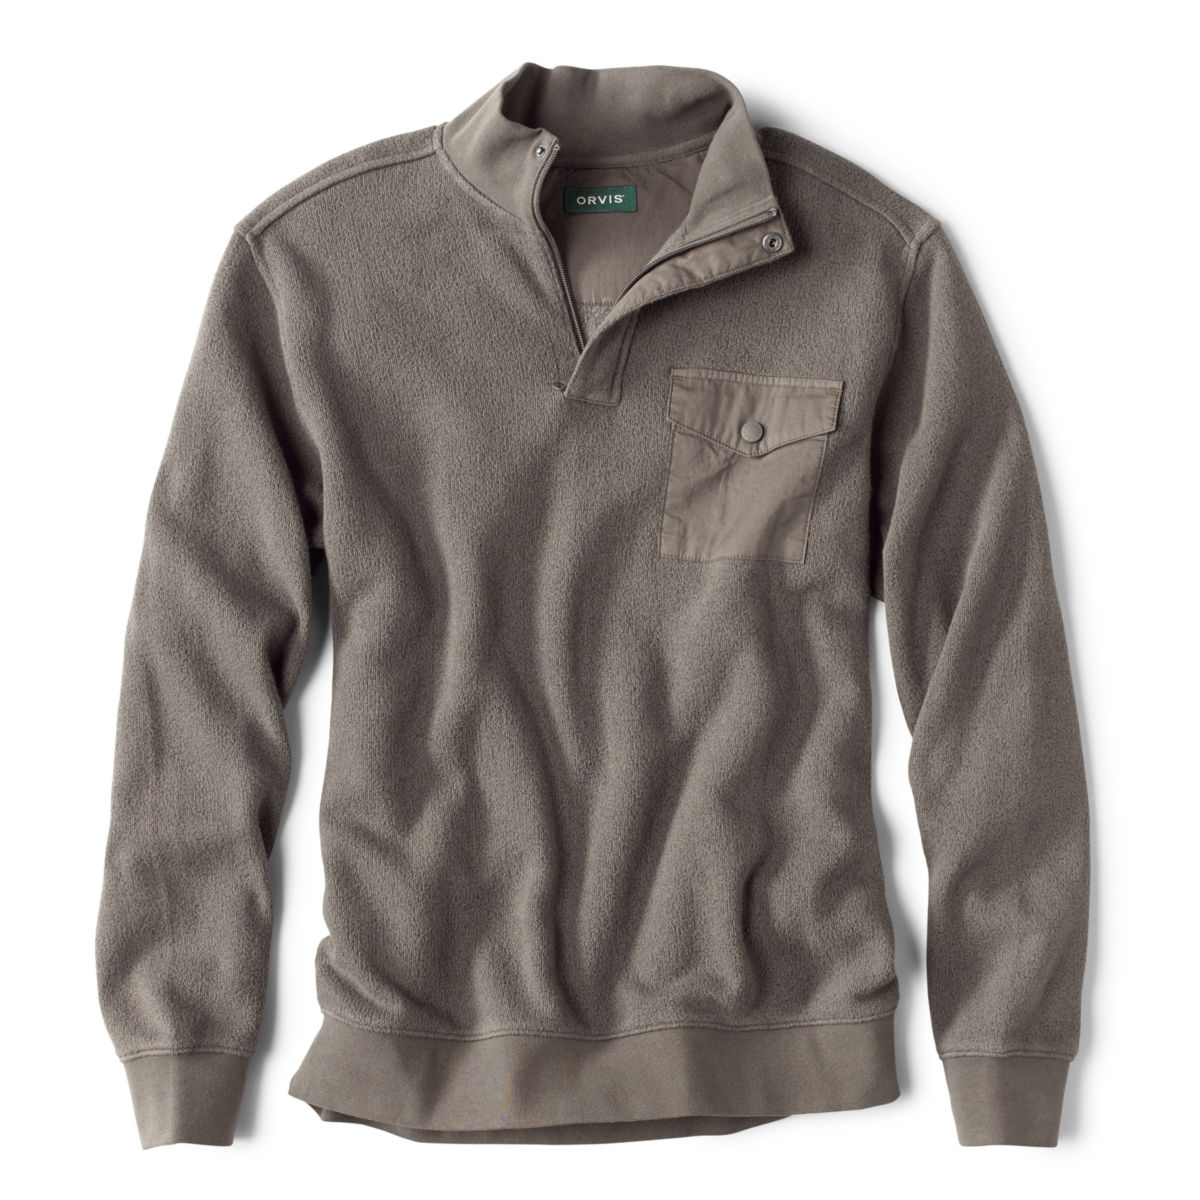 Ultimate Ultra-Ragg Quarter-Zip Sweatshirt - GRAYimage number 0